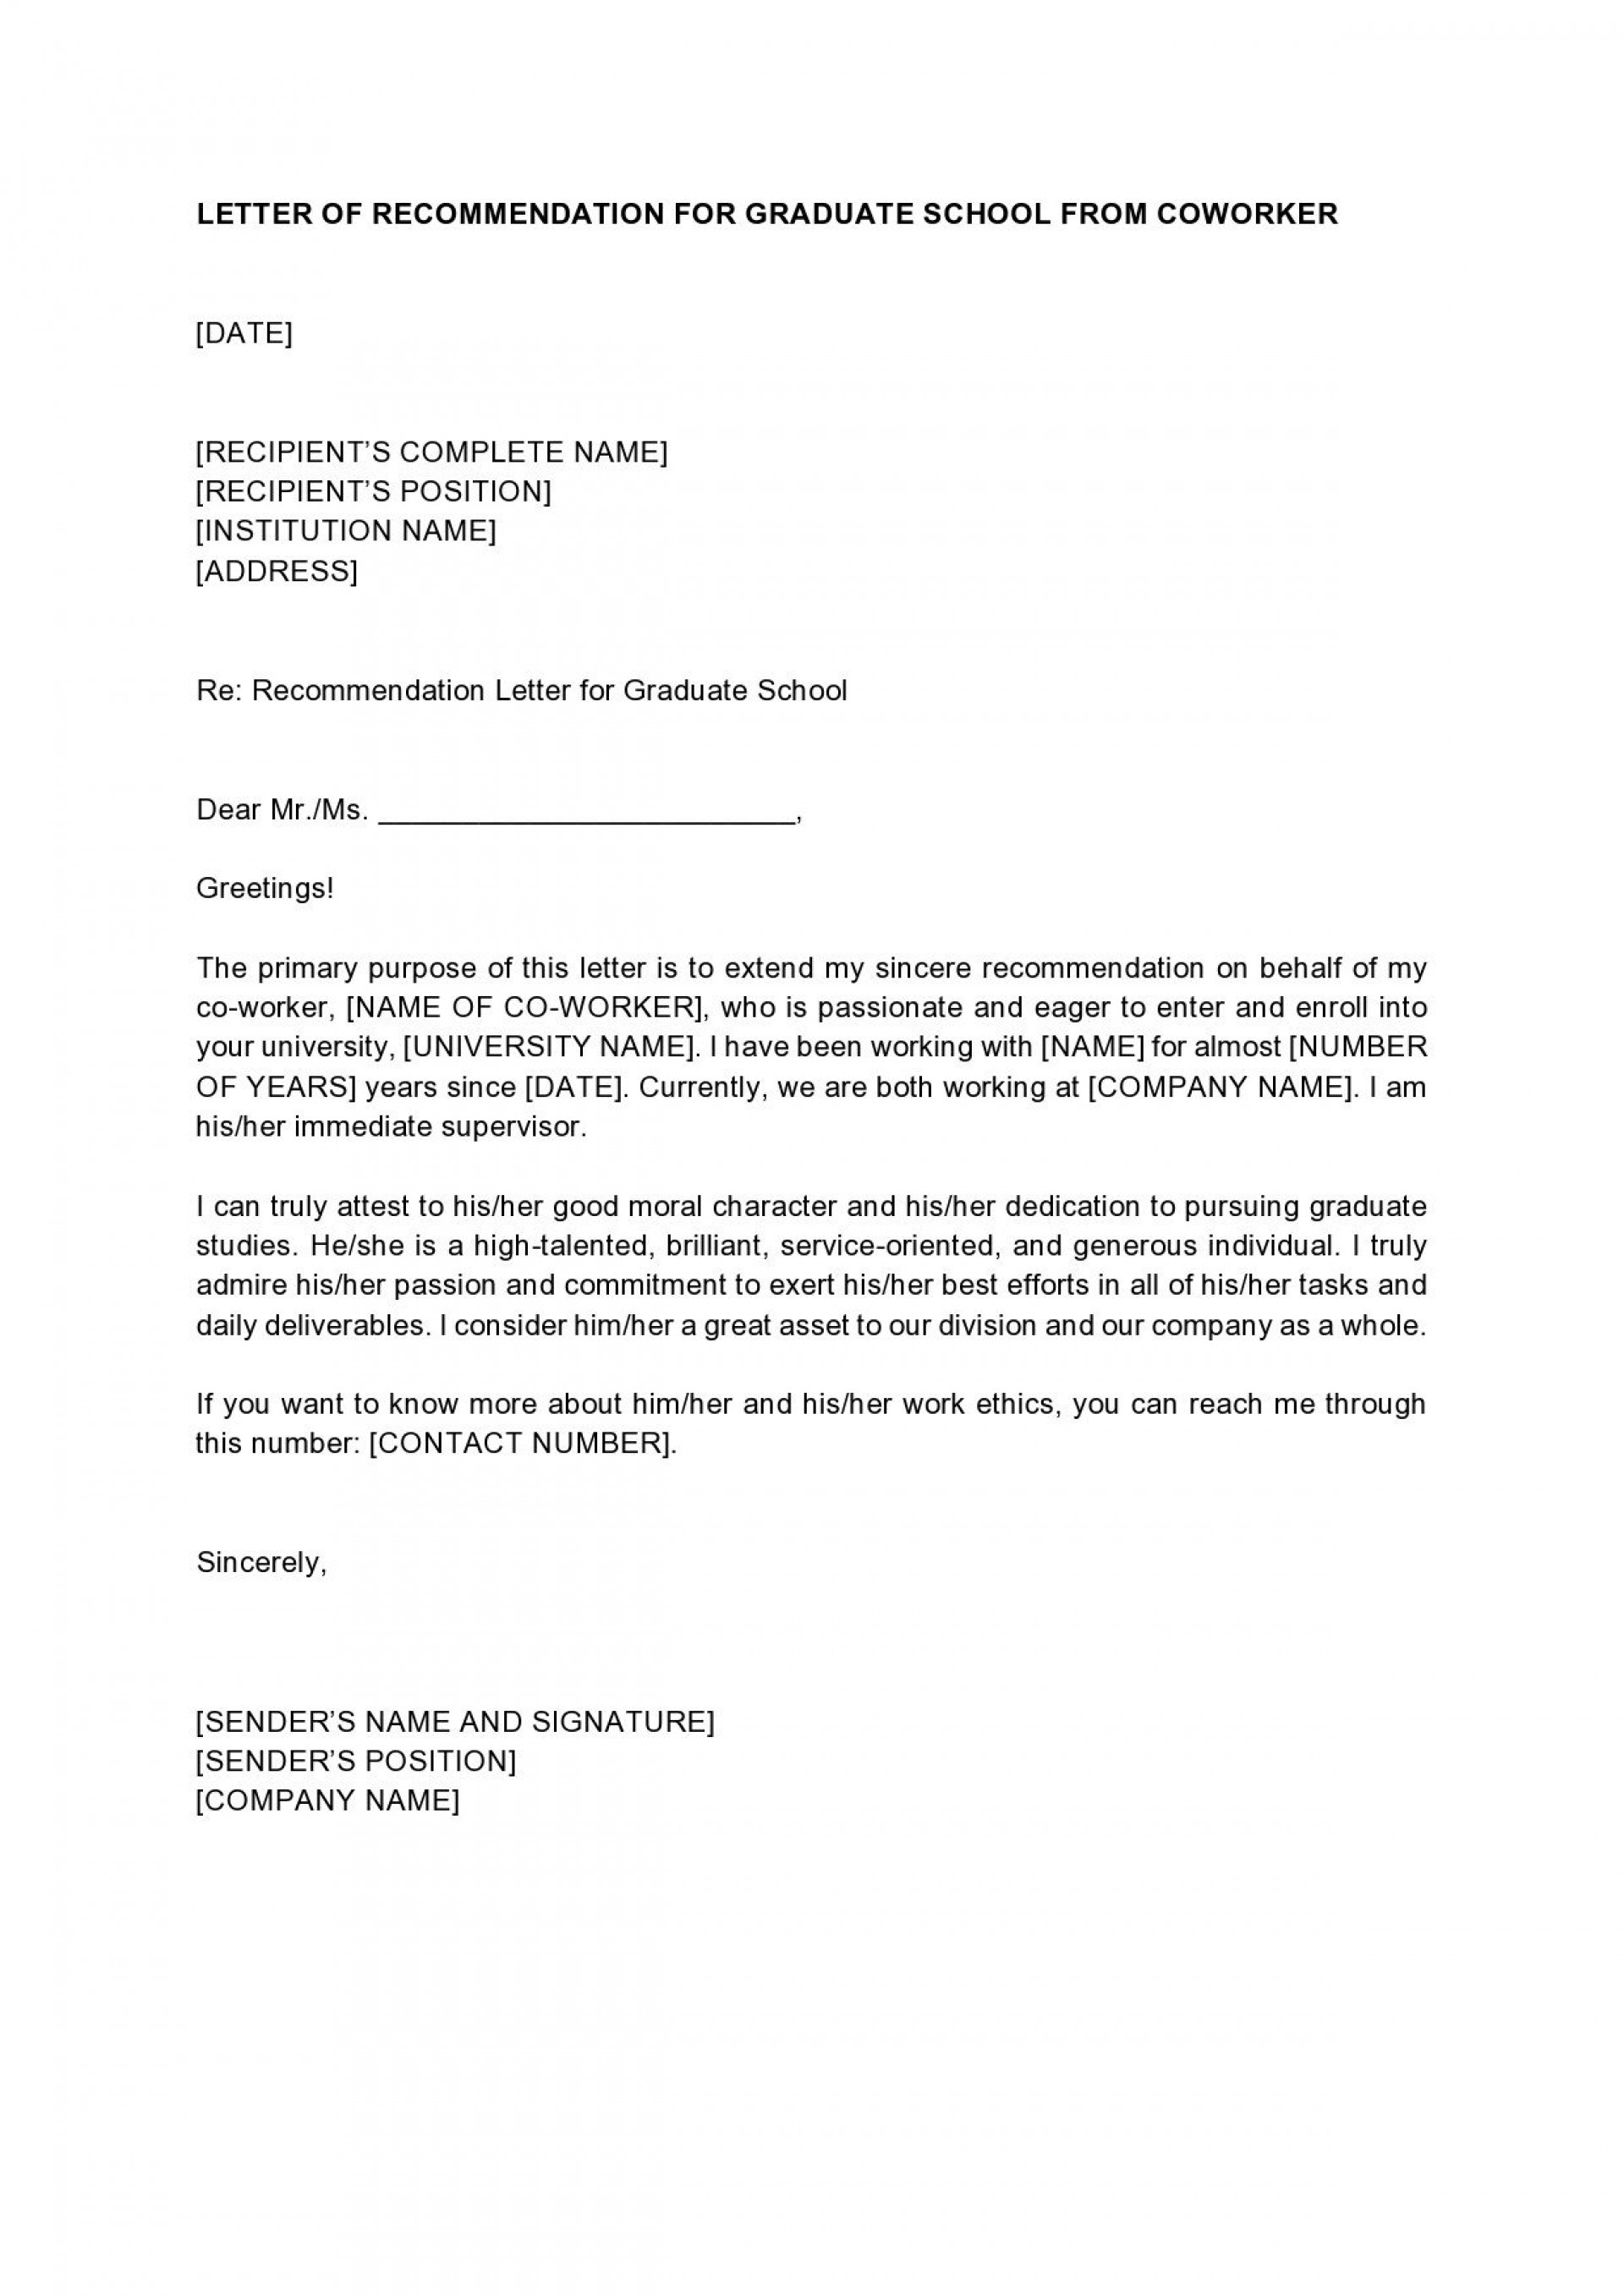 007 Dreaded Format For Letter Of Recommendation Sample High Def  Samples1920